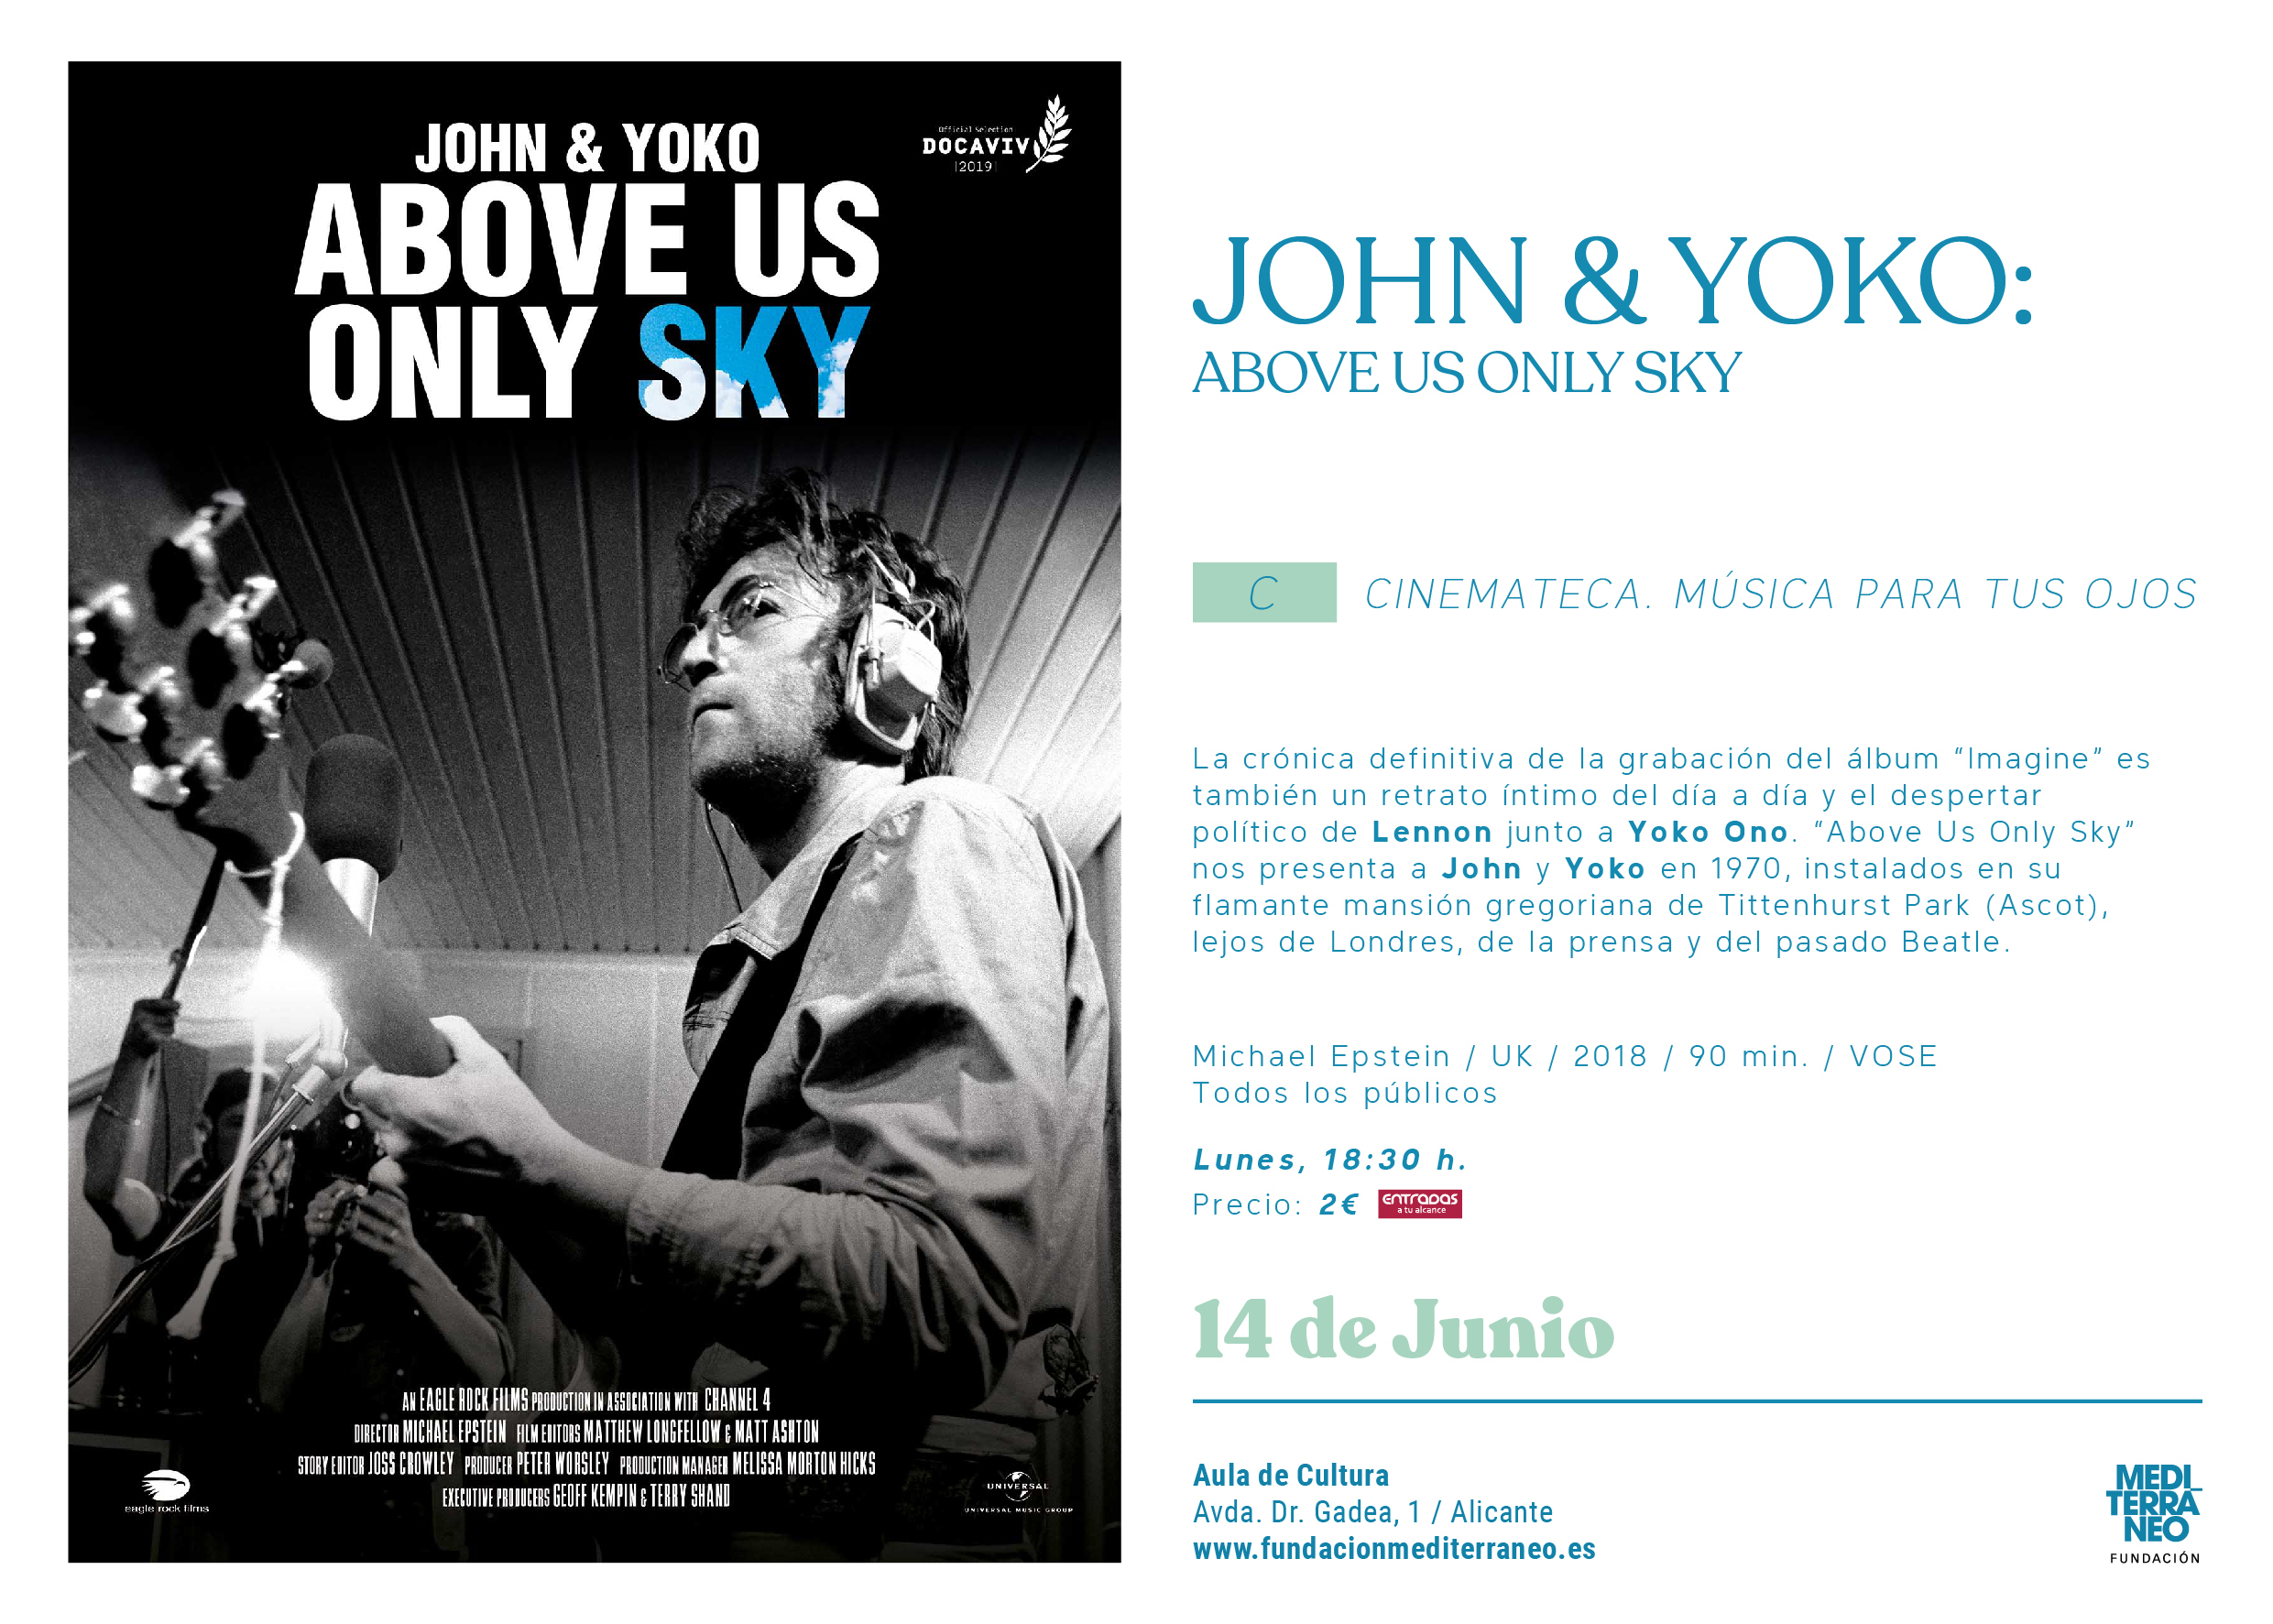 cinemateca-ciclo-musica-para-tus-ojos-john-and-yoko-above-us-onl-6093af604ed8c.jpeg